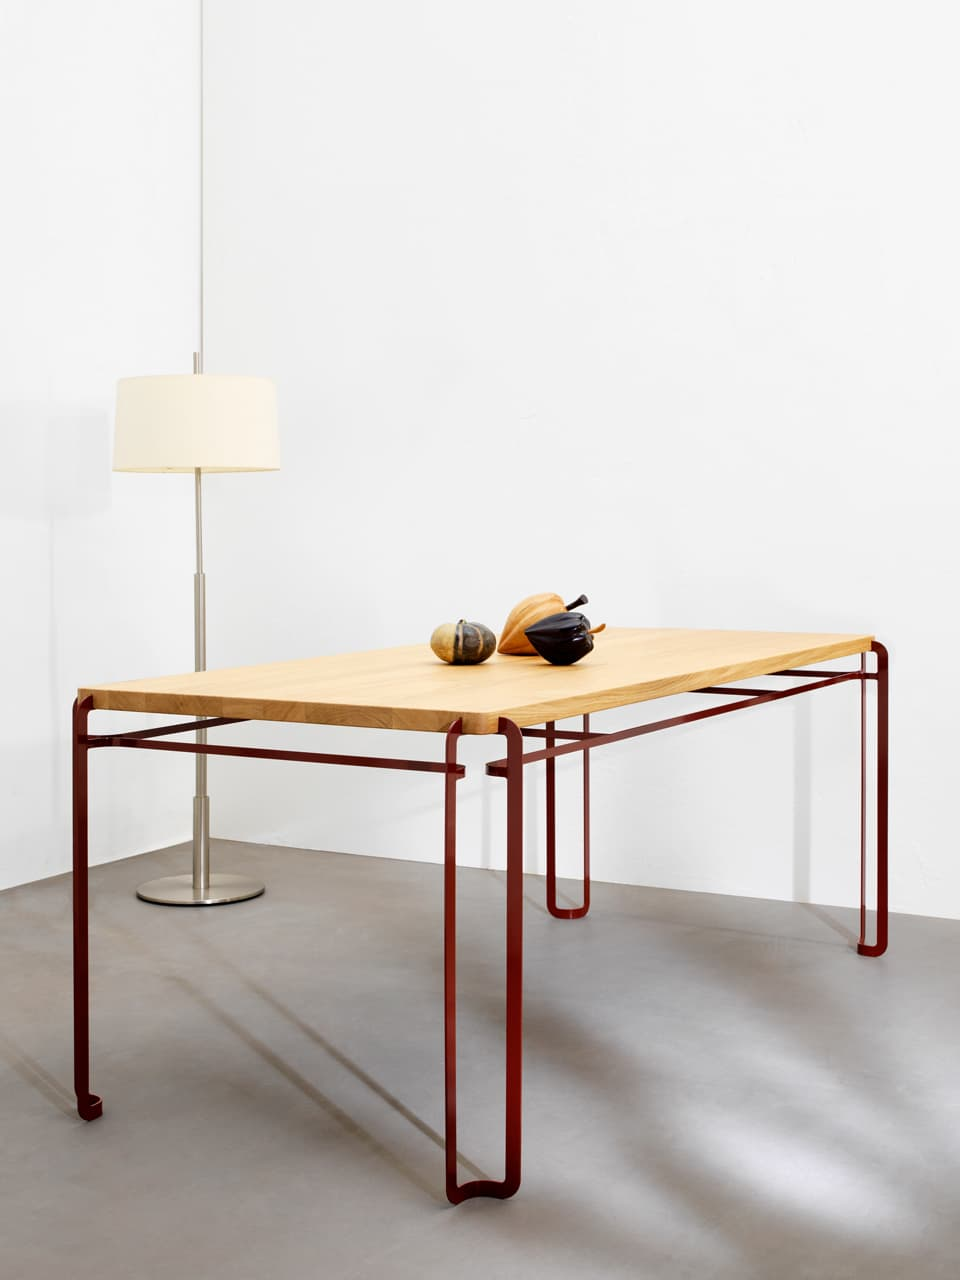 frattinifrilli VACO table